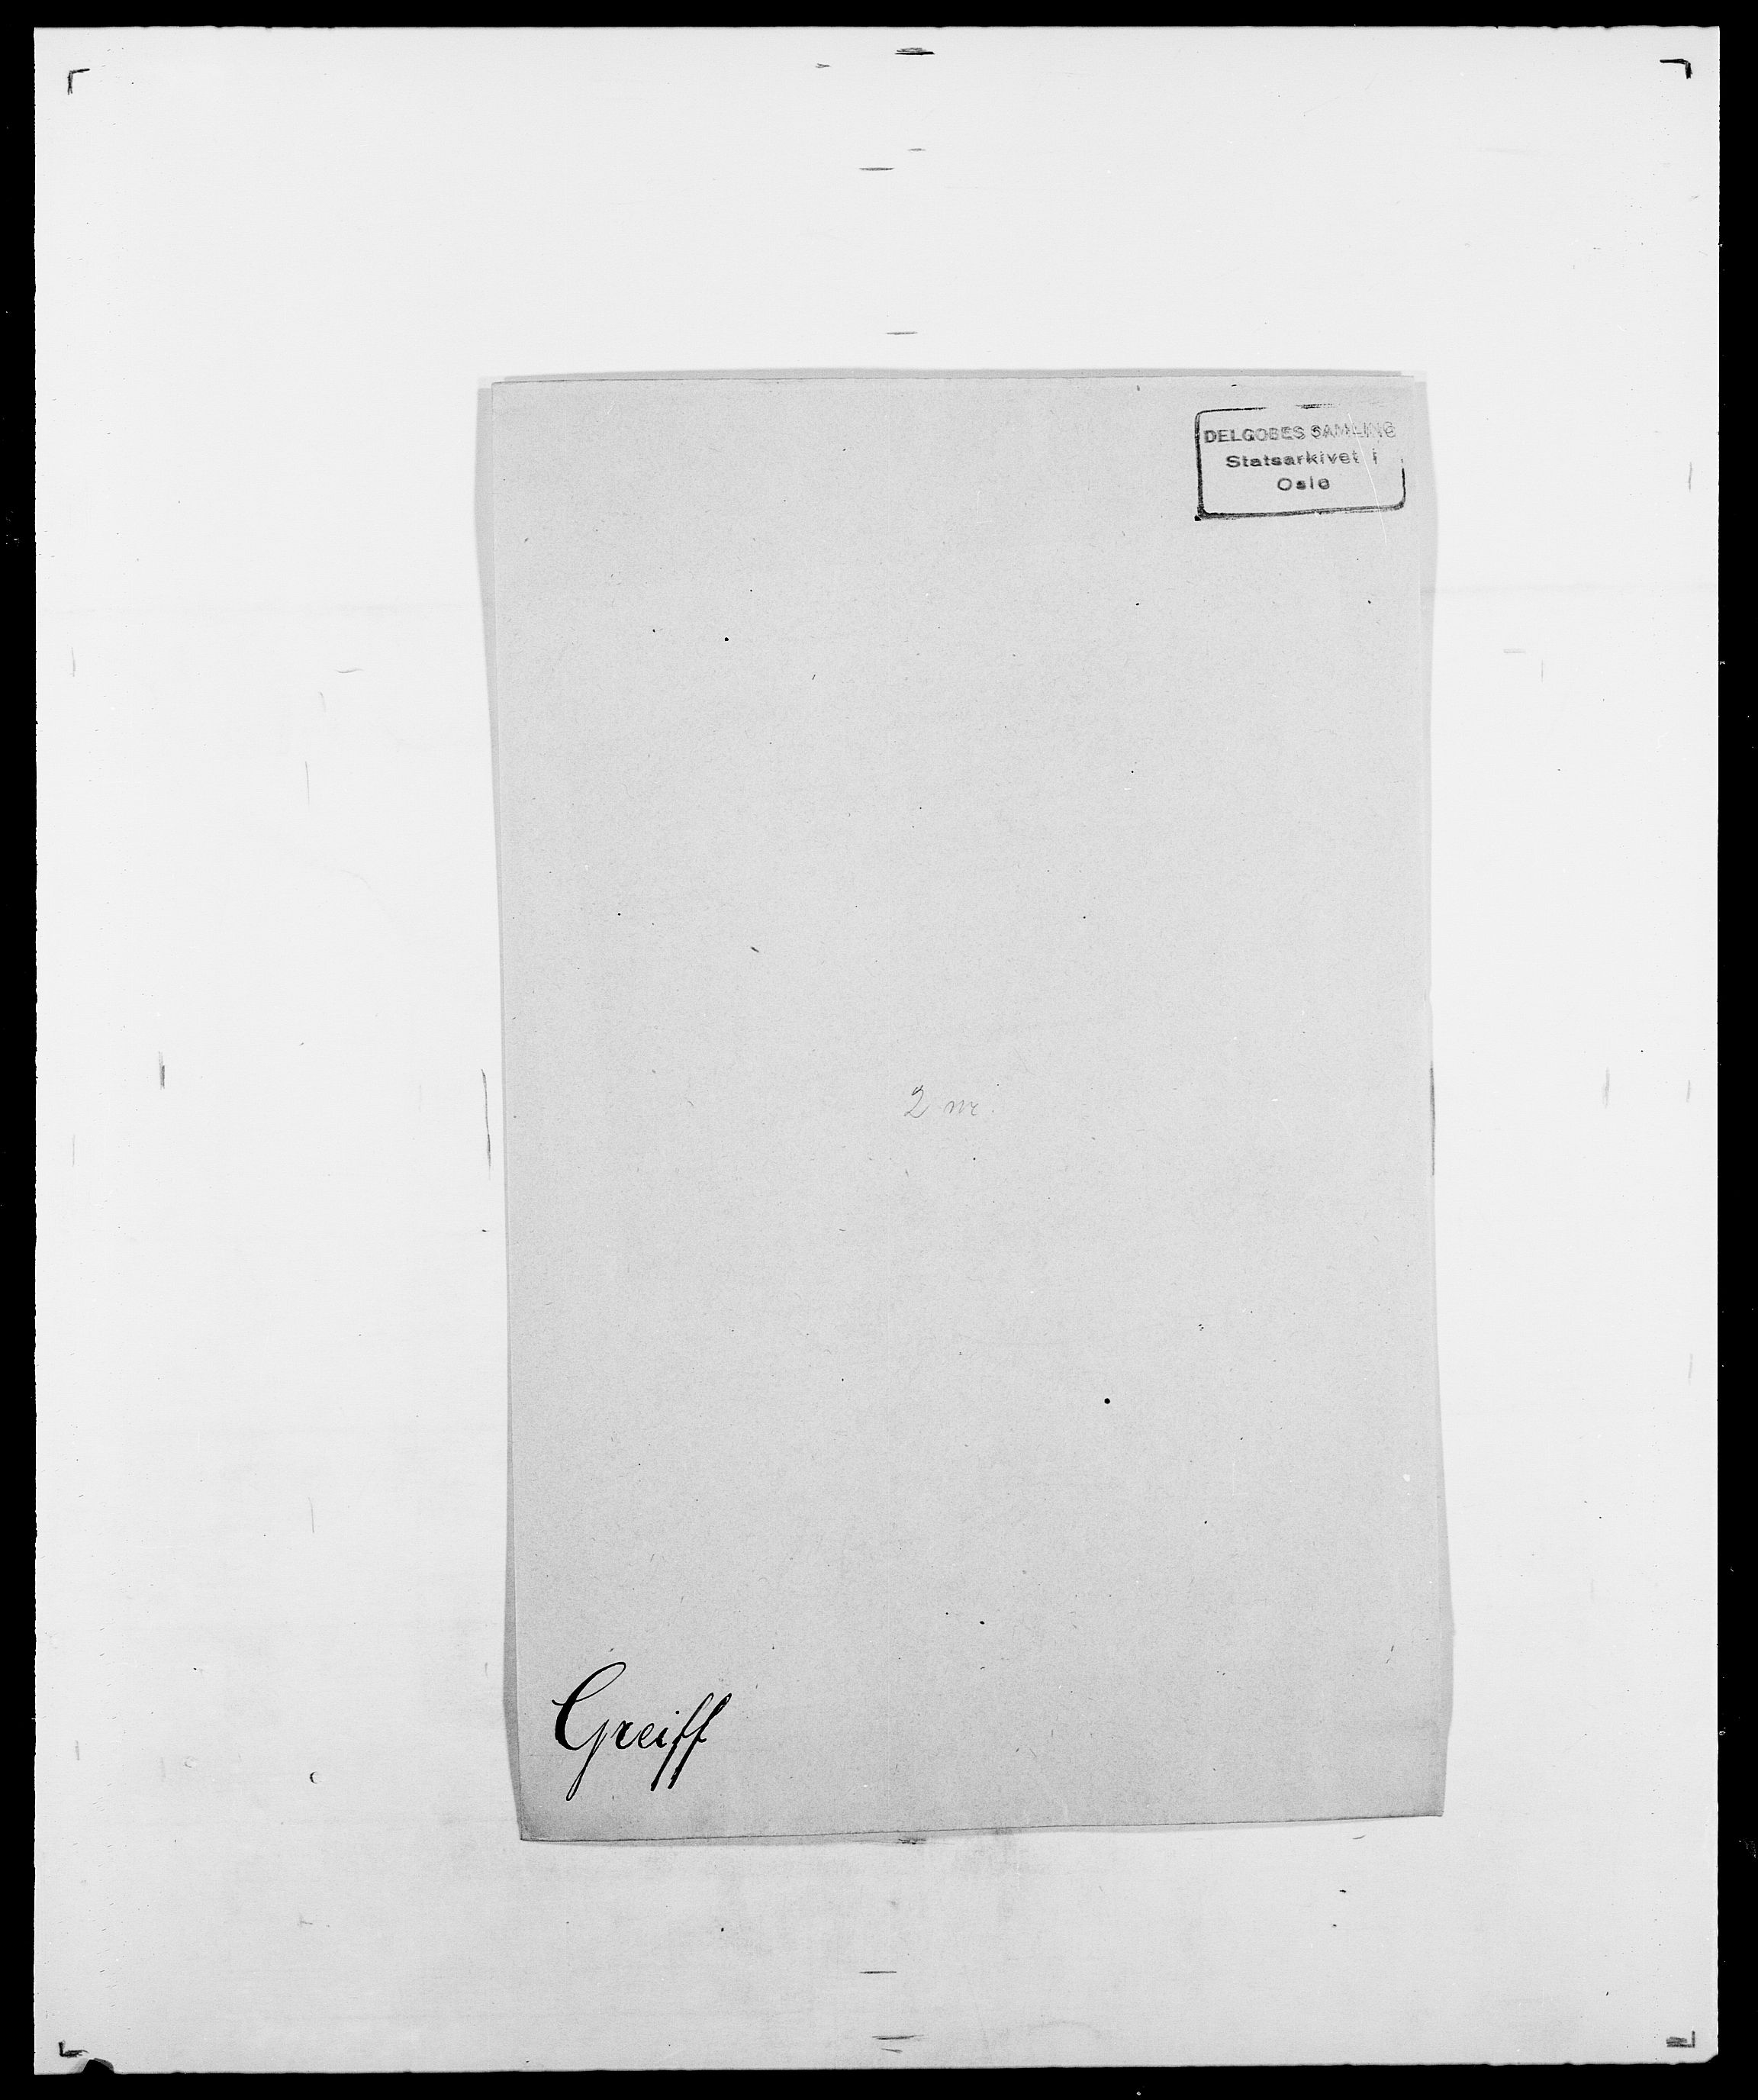 SAO, Delgobe, Charles Antoine - samling, D/Da/L0014: Giebdhausen - Grip, s. 601